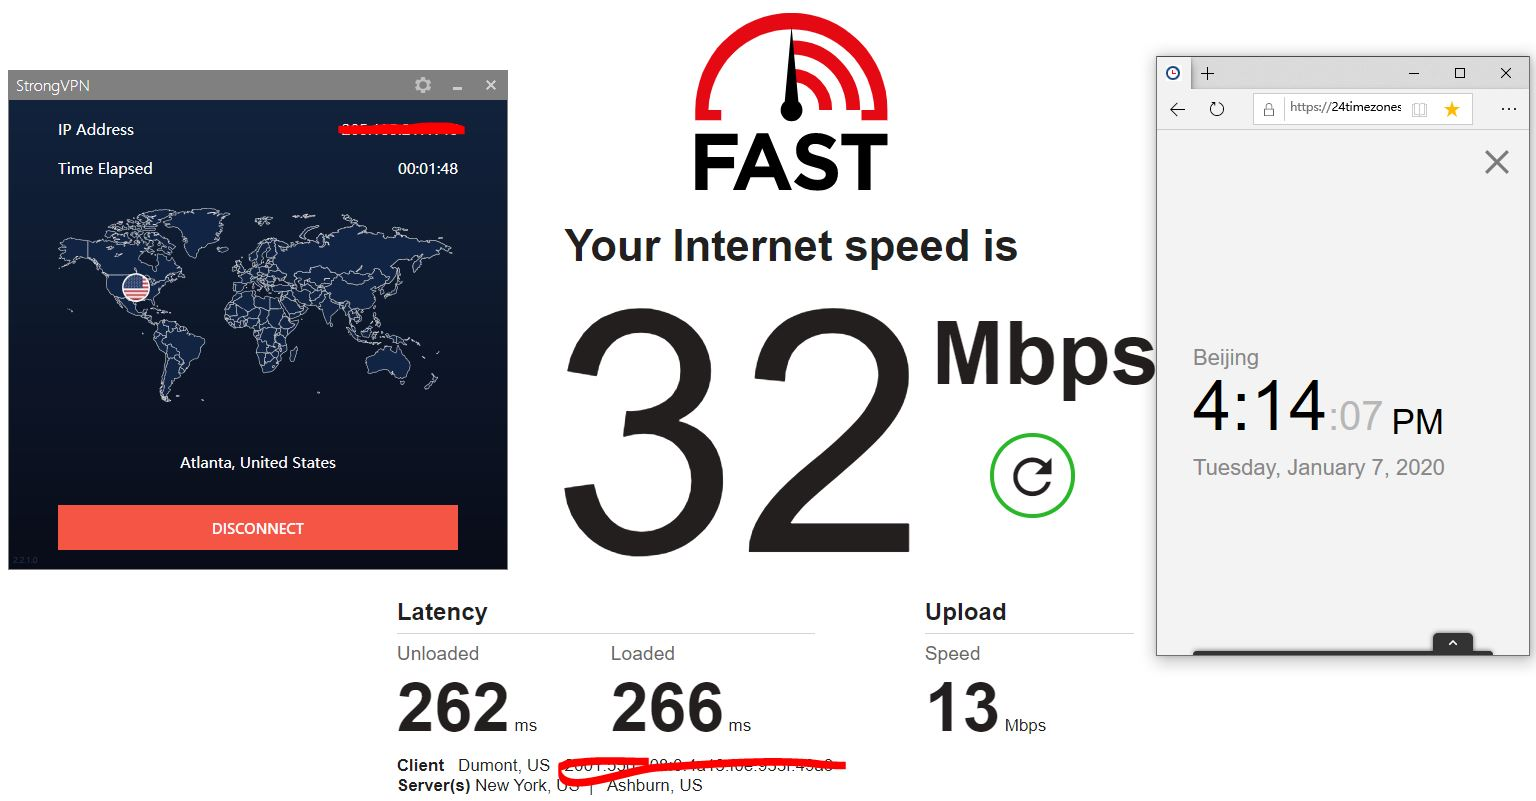 Windows10 StrongVPN USA - Atlanta 中国VPN翻墙 科学上网 SpeedTest测速-20200107